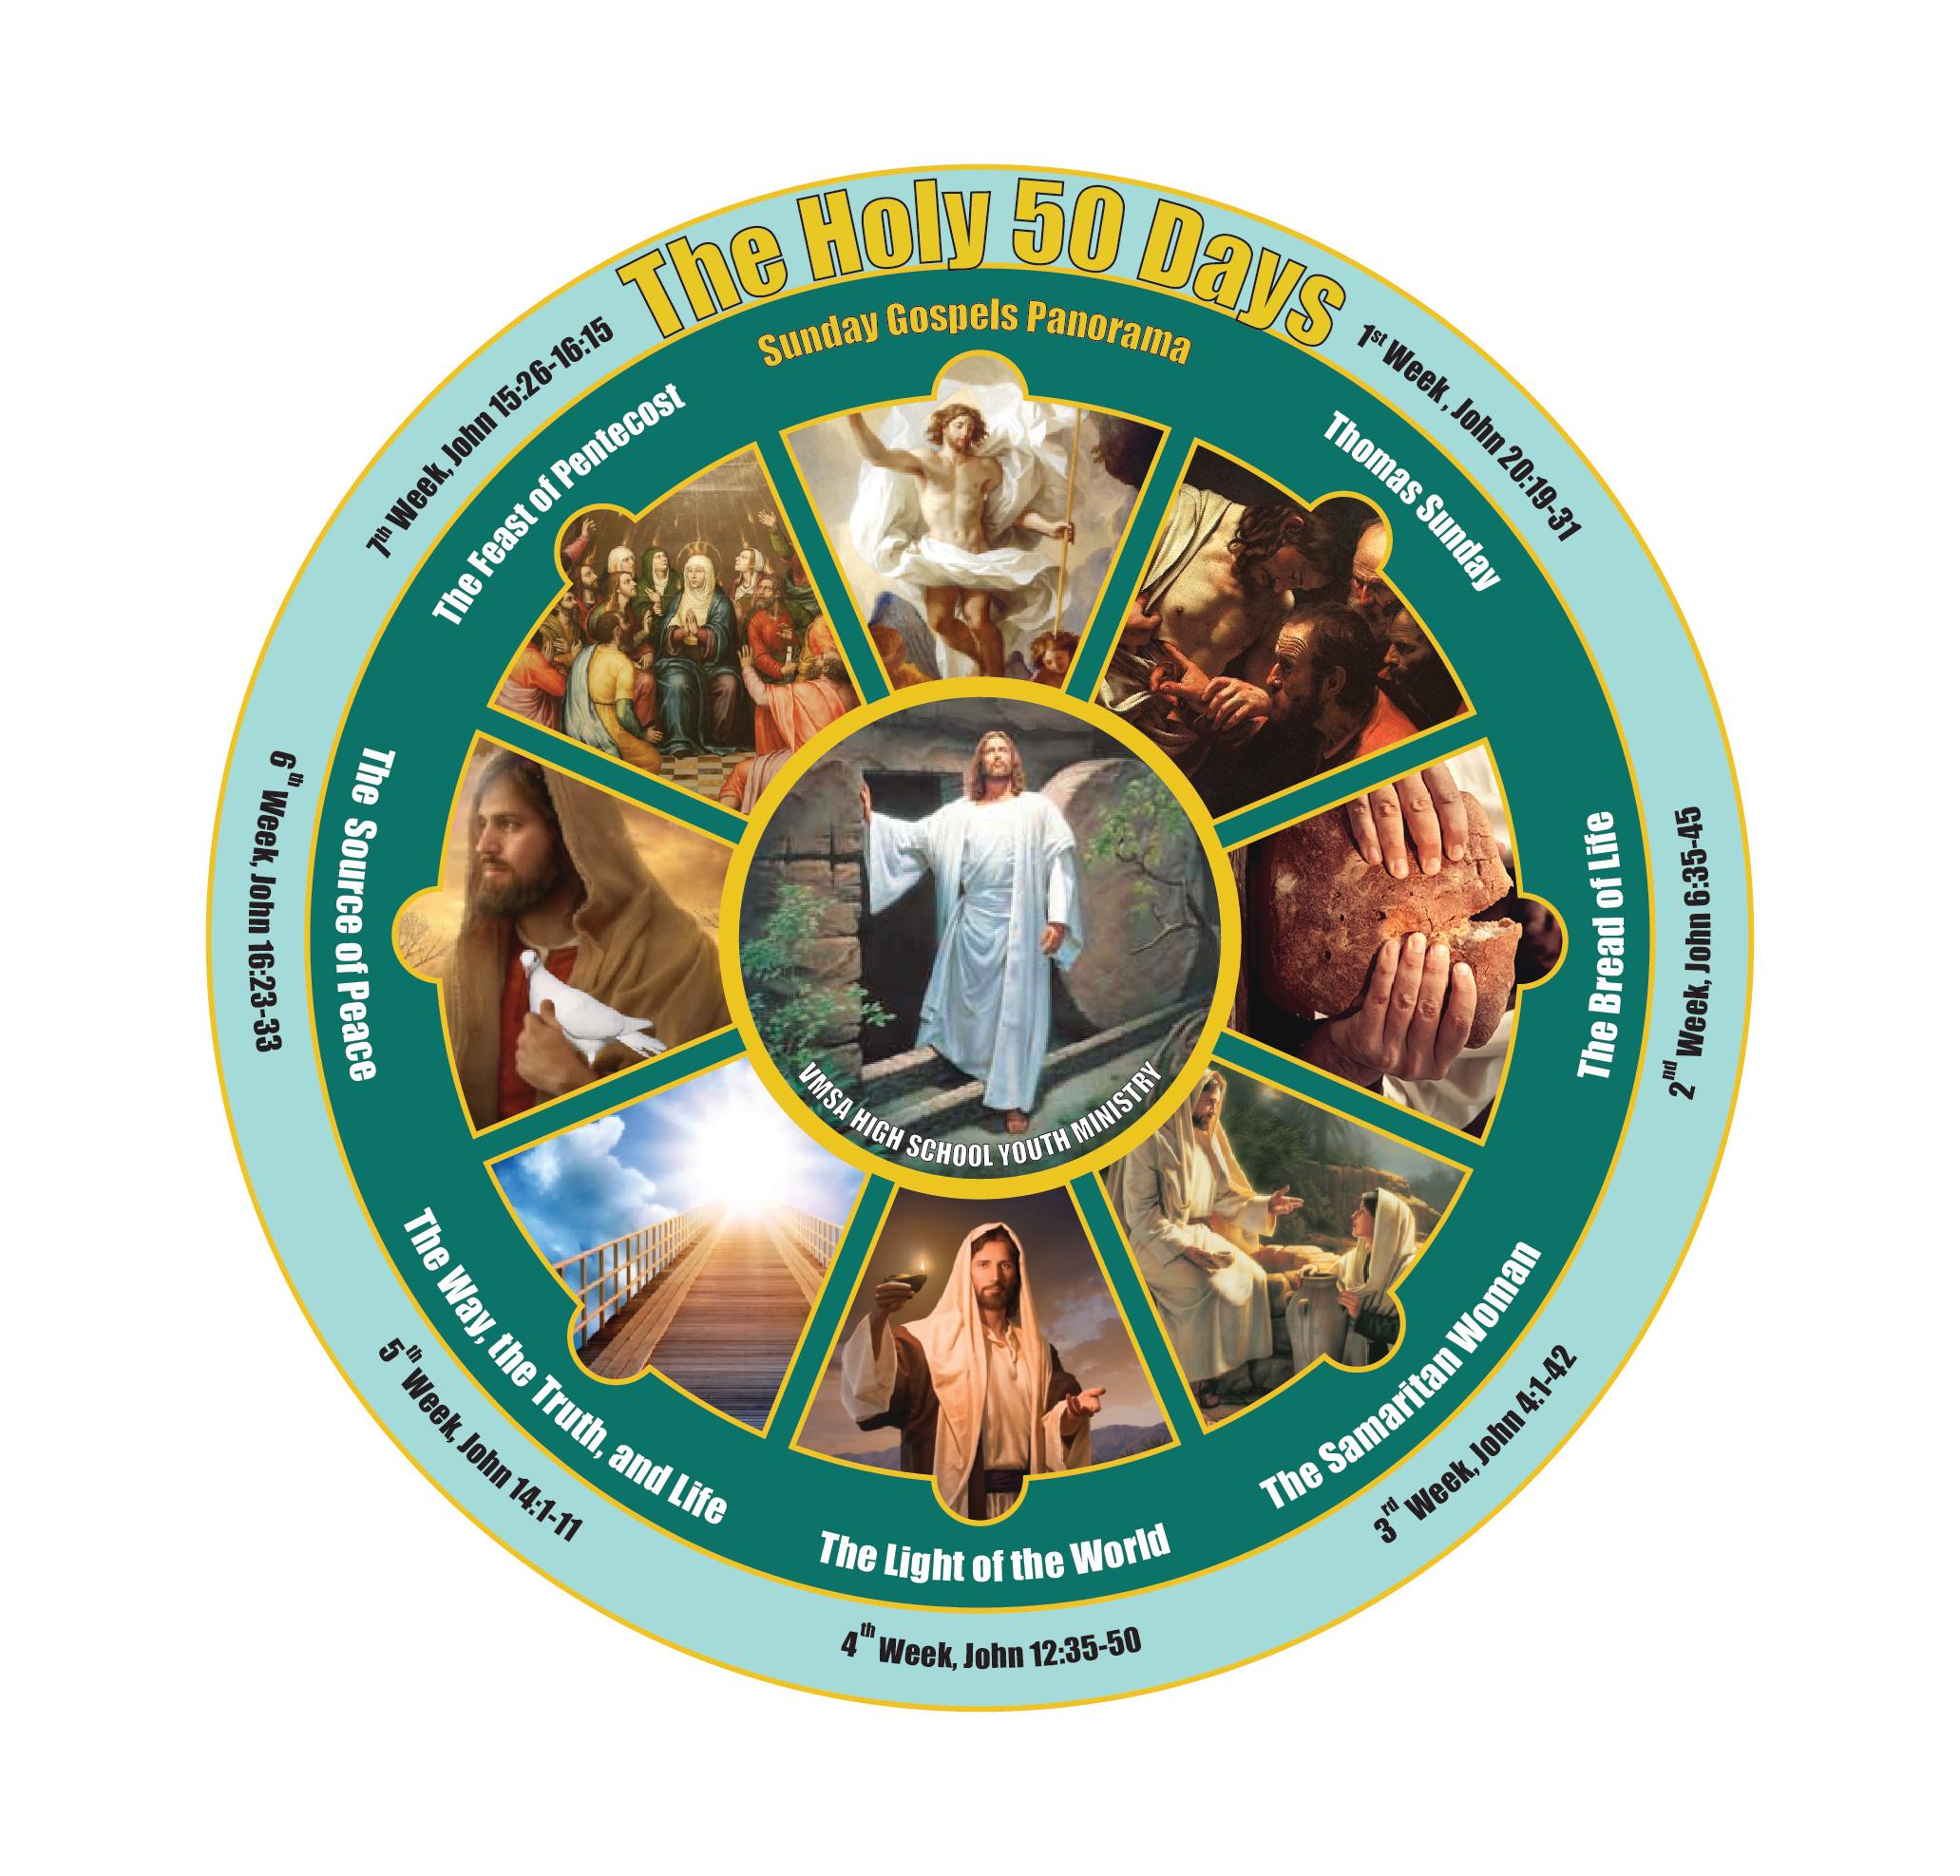 Holy 50-Pentecost Panorama